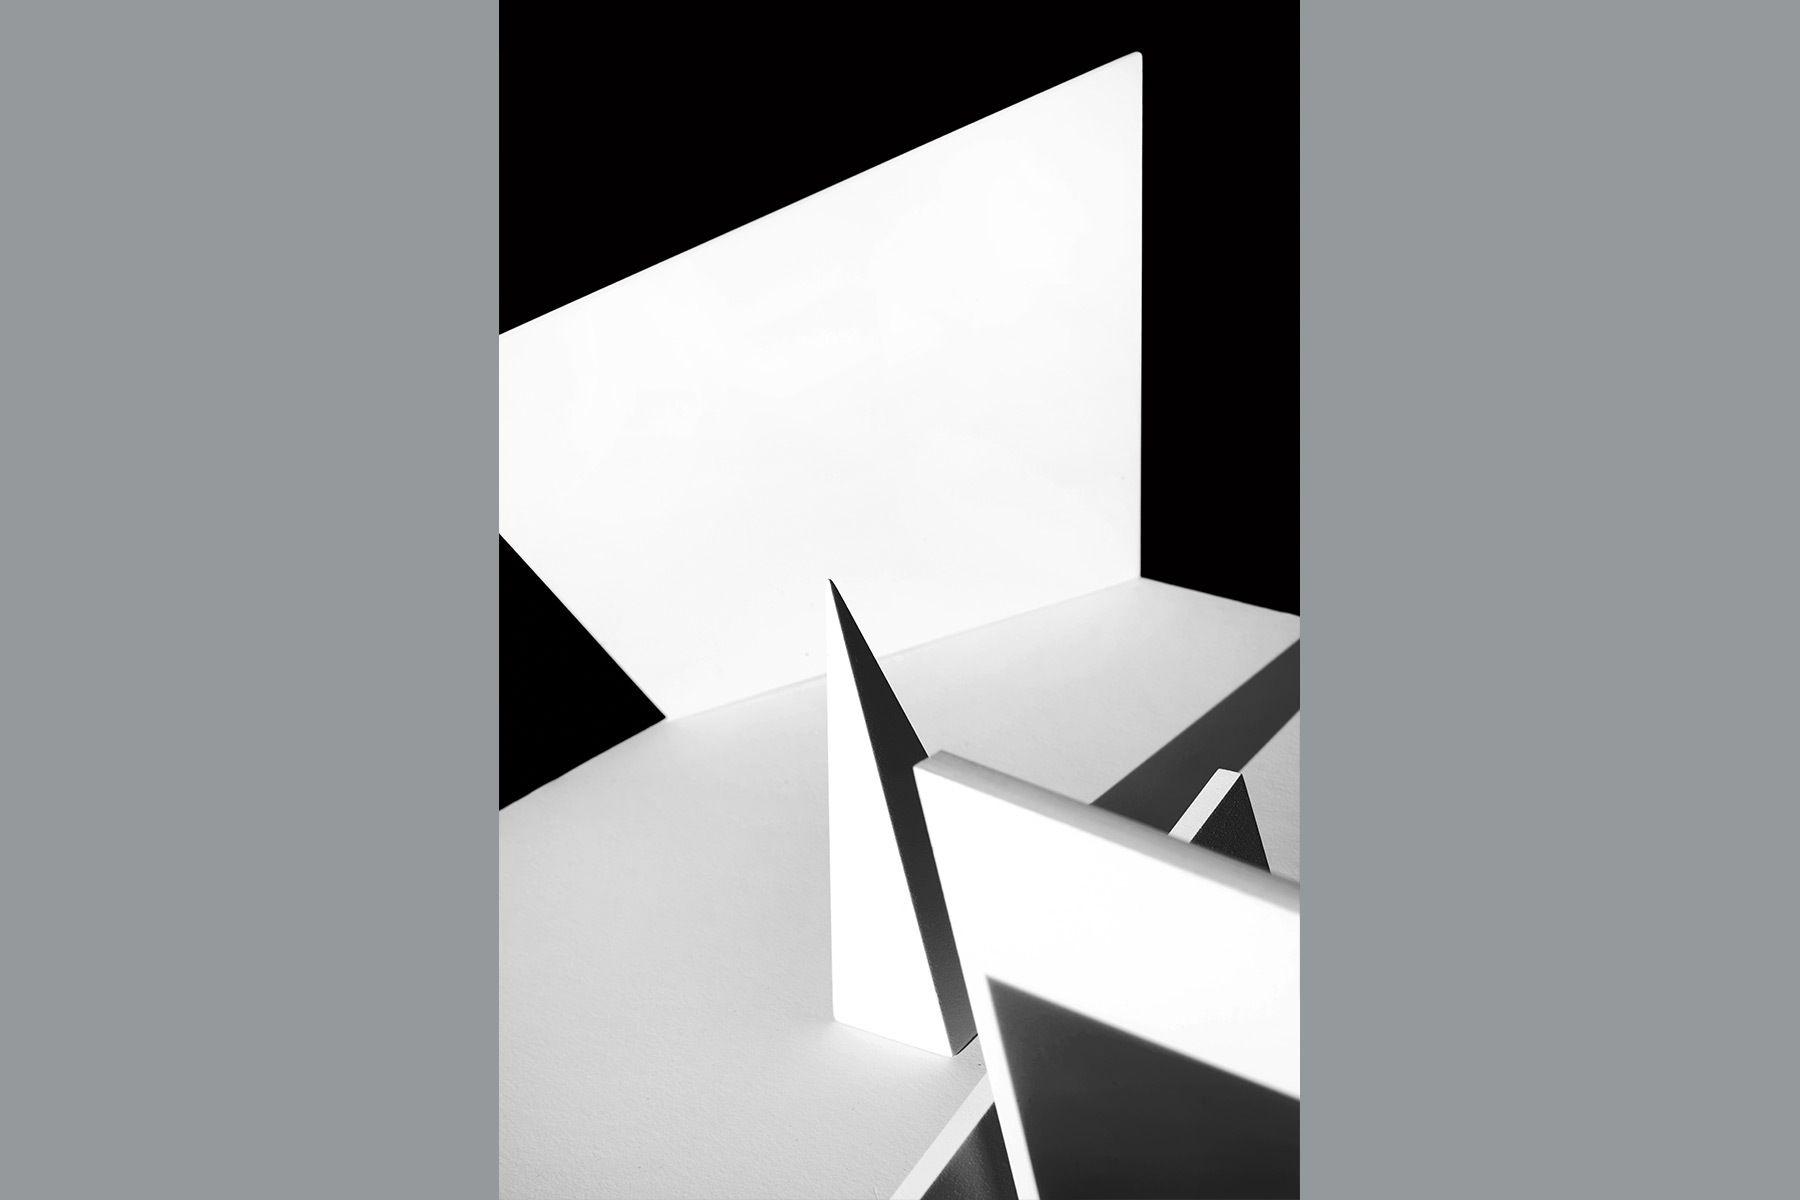 1murtwood_livebooks_template_alt_copy.jpg